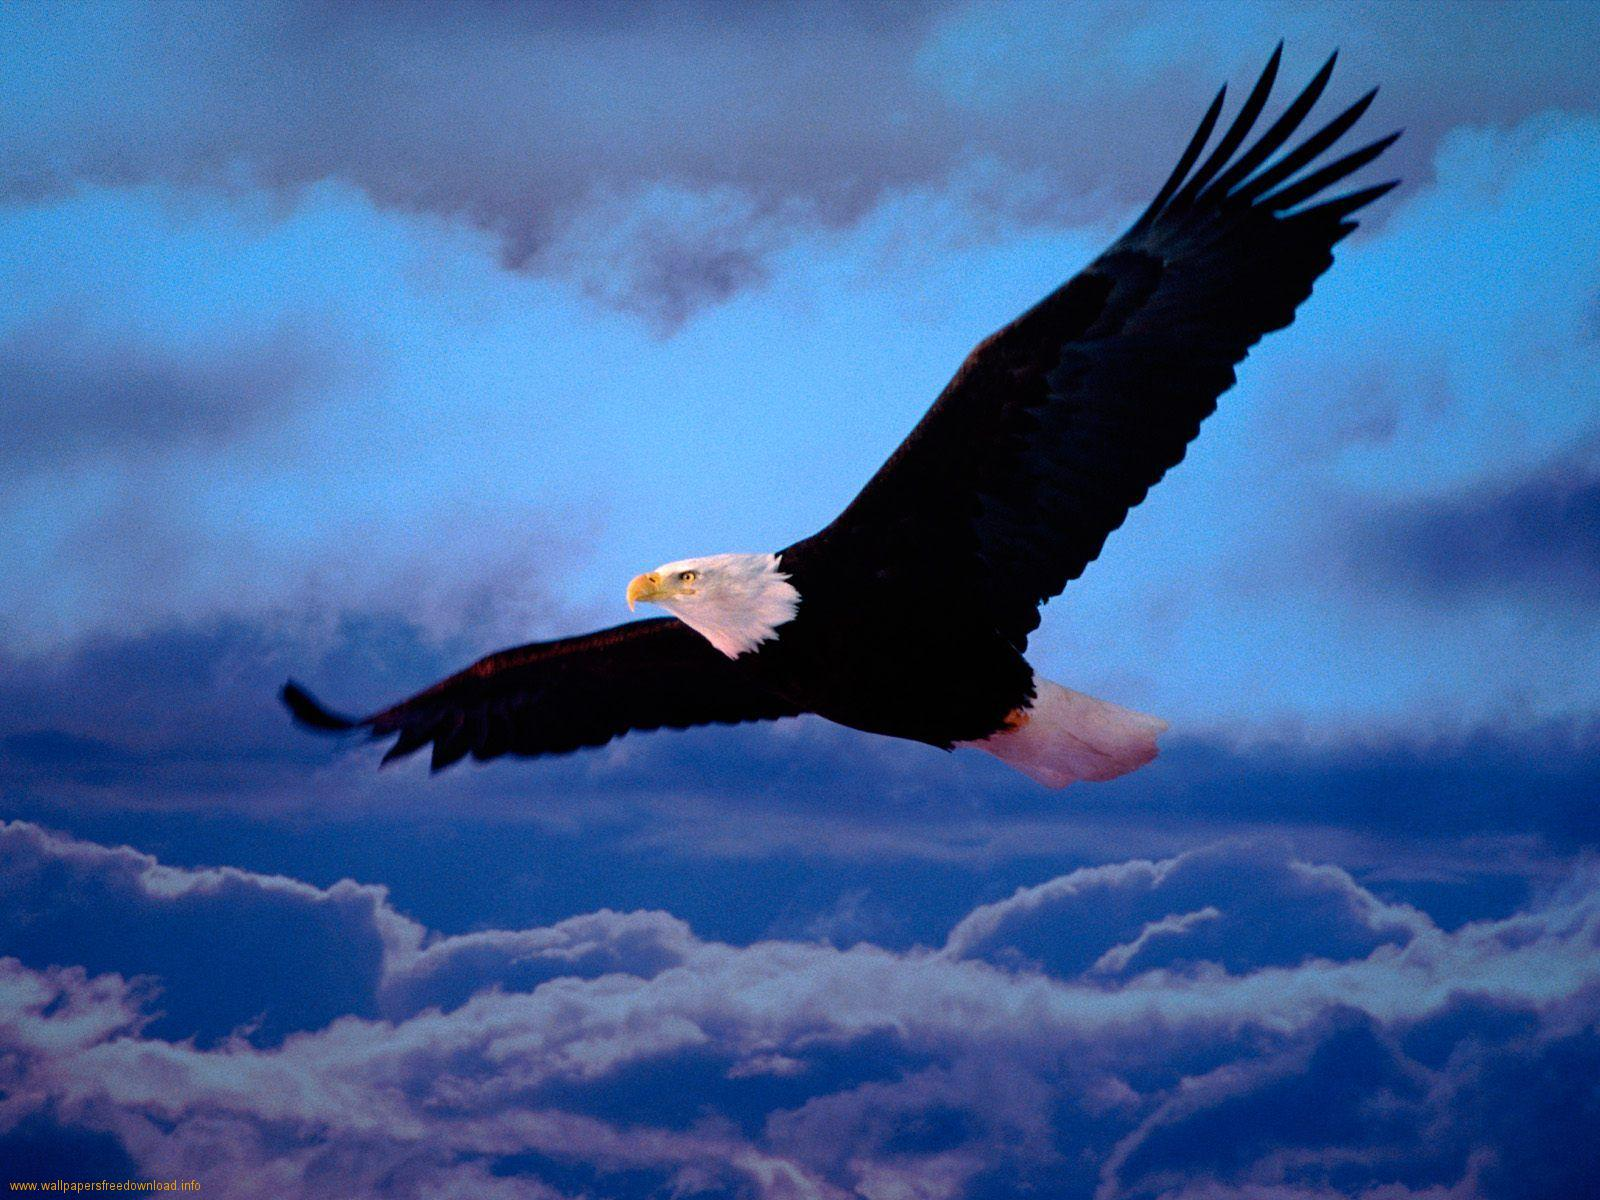 http://miraclesofthequran.persiangig.com/Zistshenasi/flying-eagle_4-1.jpeg